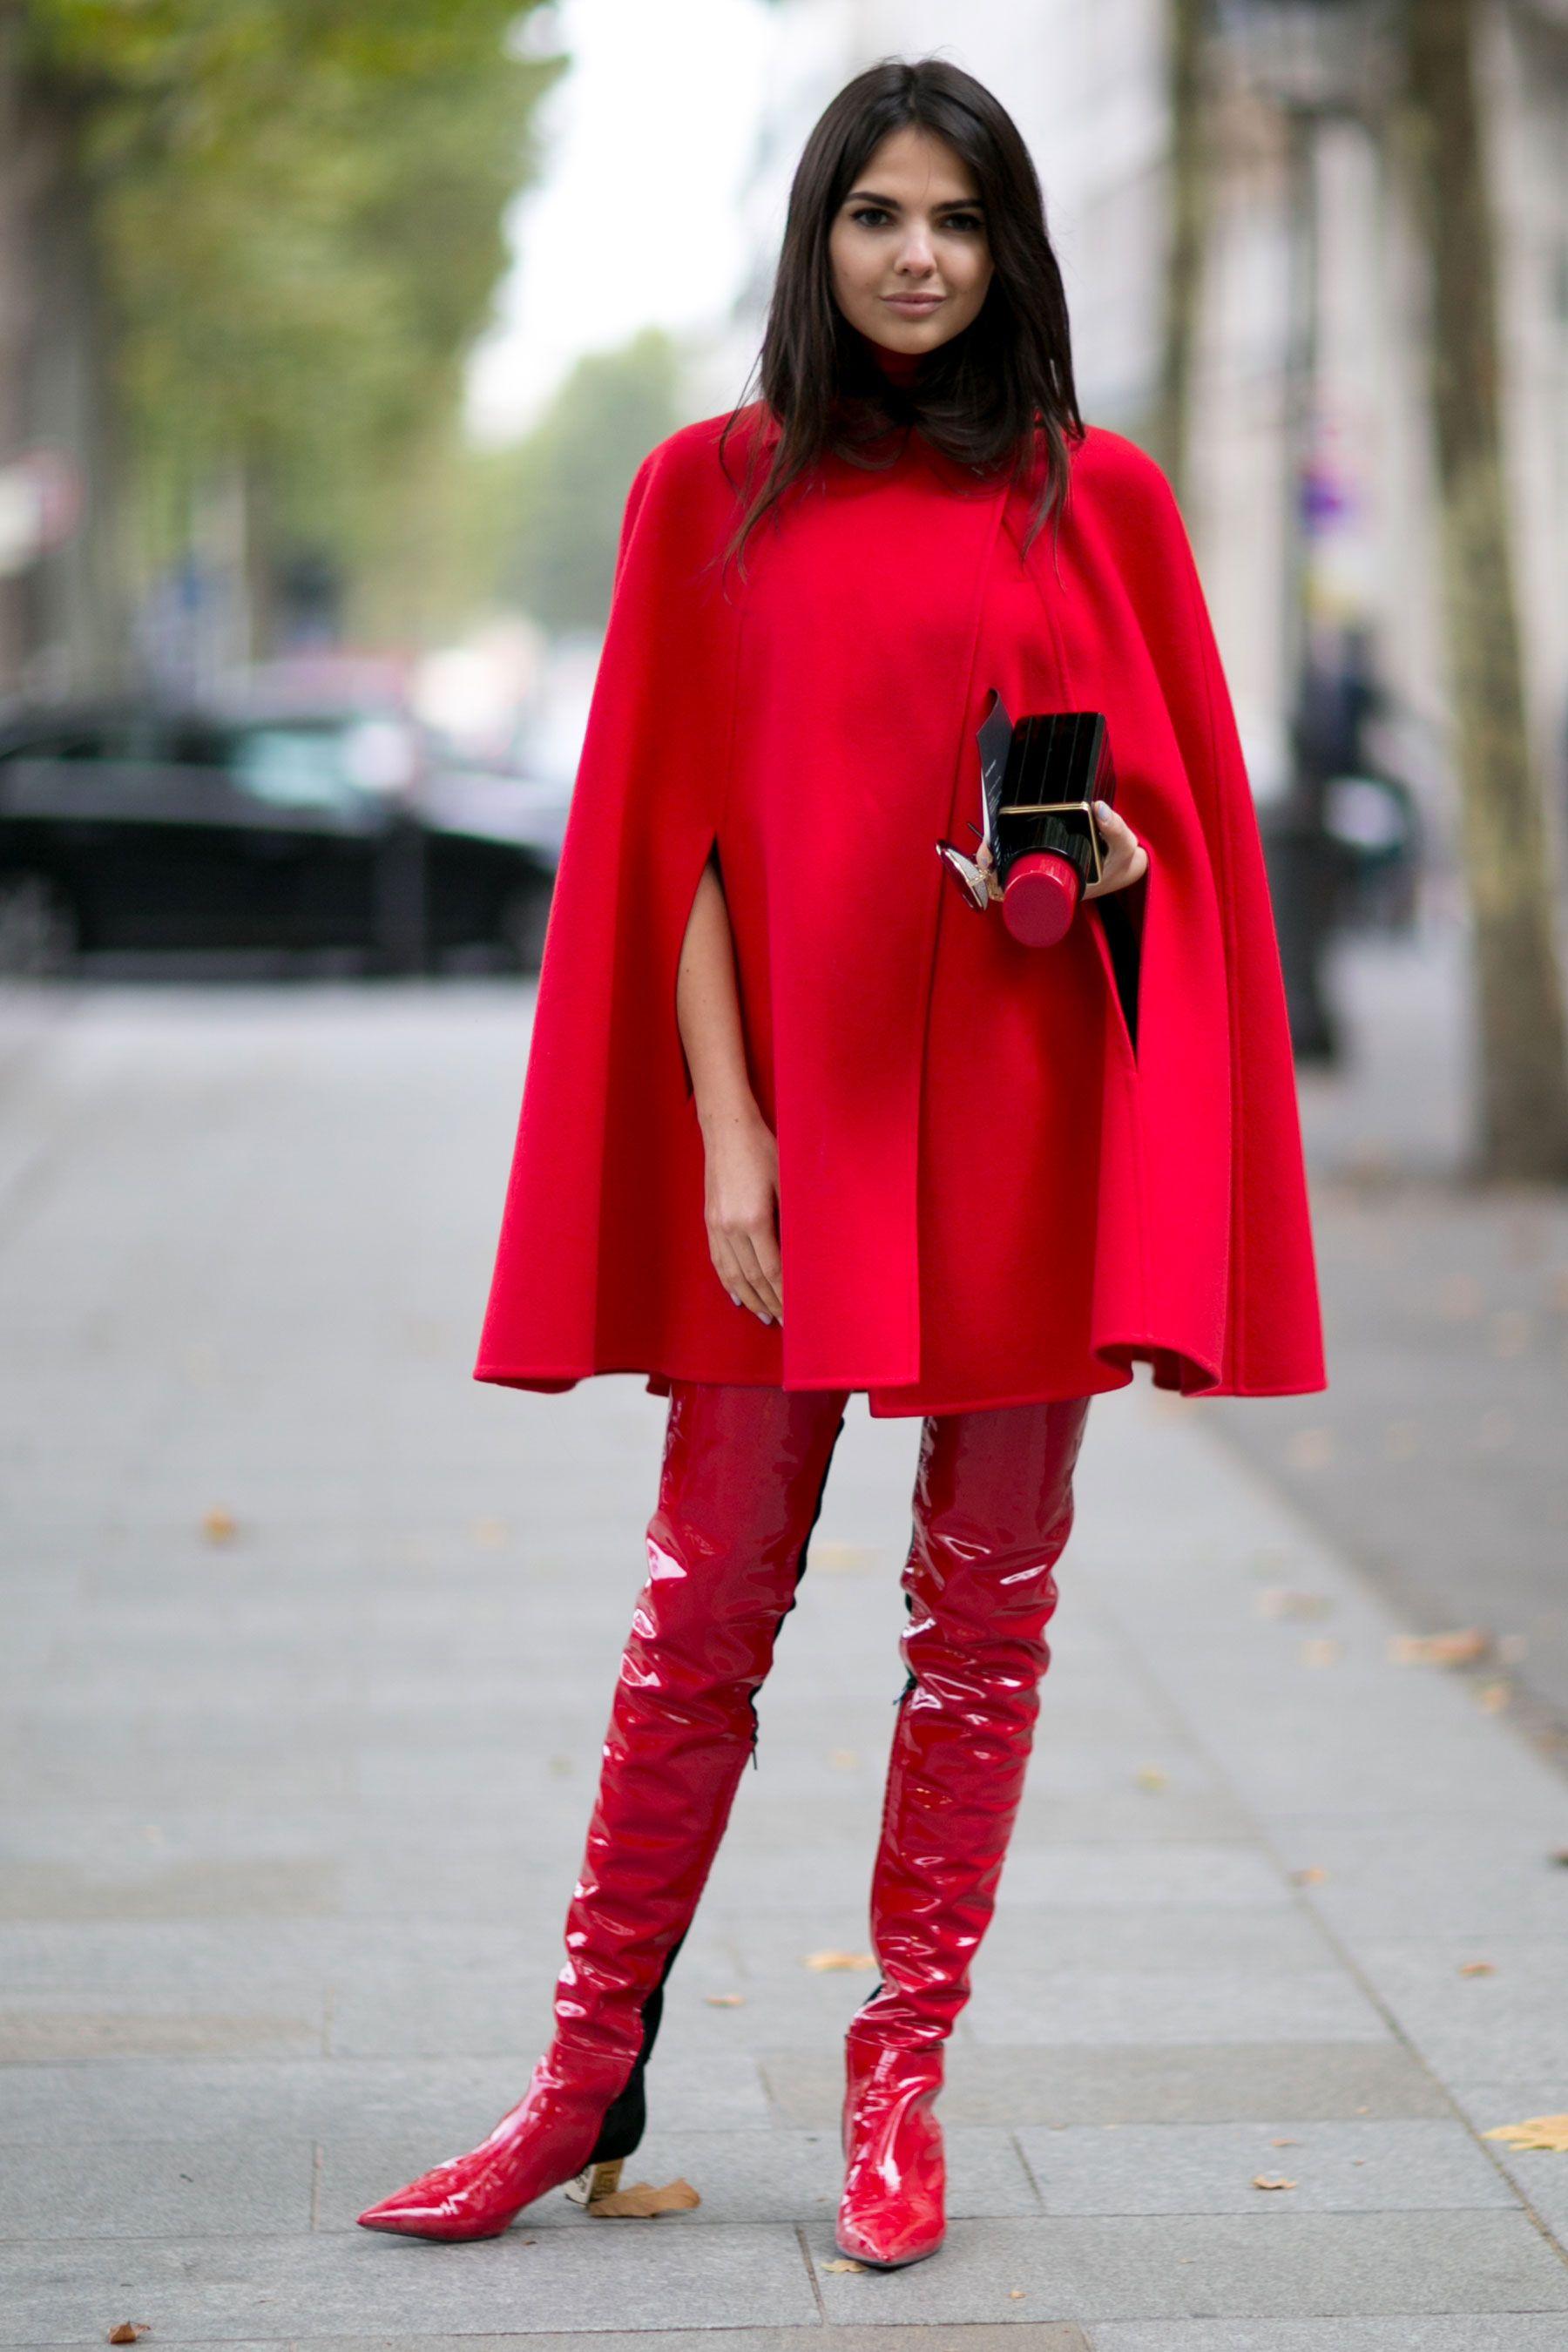 street style paris le total look rouge fashion week. Black Bedroom Furniture Sets. Home Design Ideas